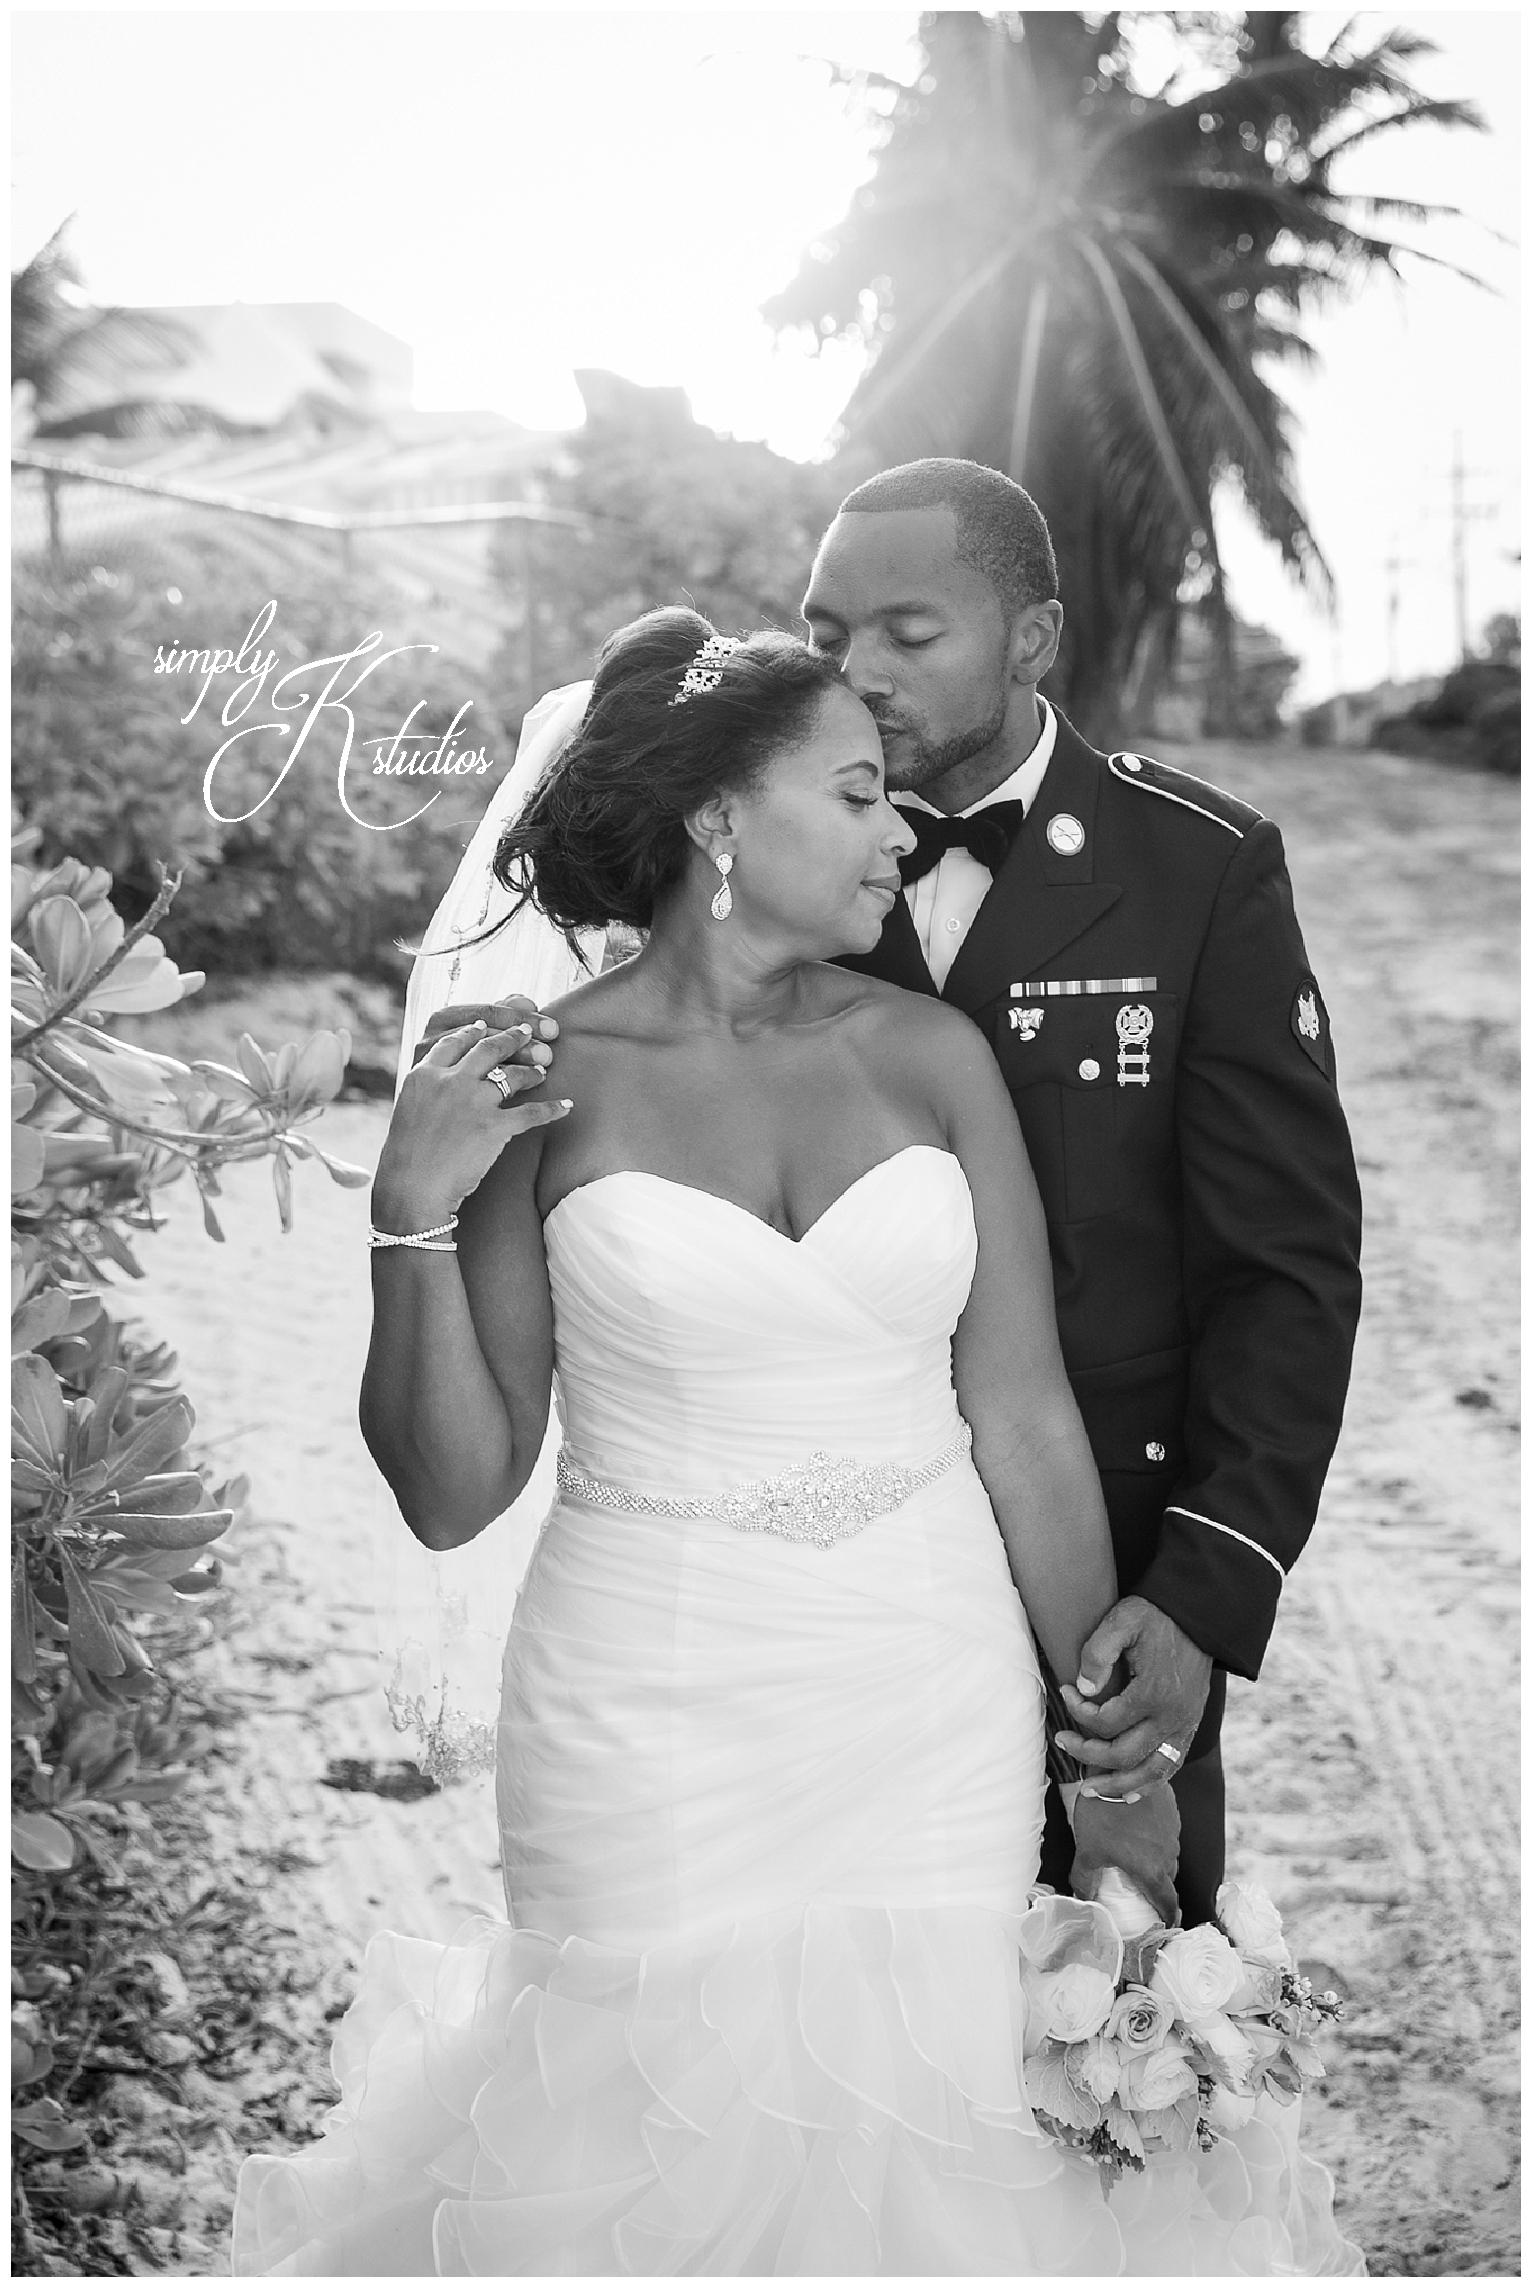 Wedding Photos at Dreams Riviera Cancun.jpg